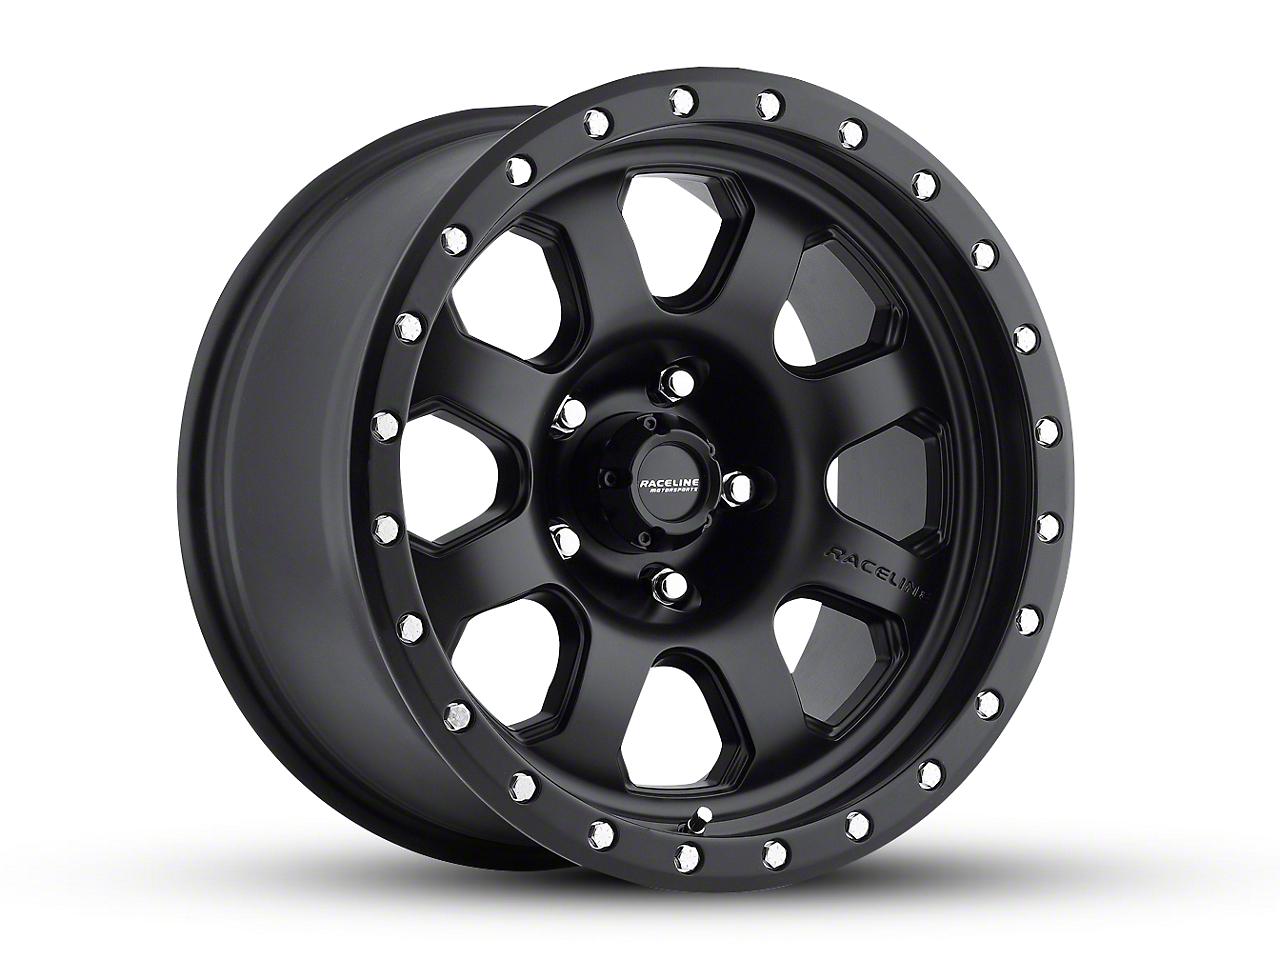 Raceline SL Avenger Black Wheel - 17x9 (07-18 Jeep Wrangler JK; 2018 Jeep Wrangler JL)